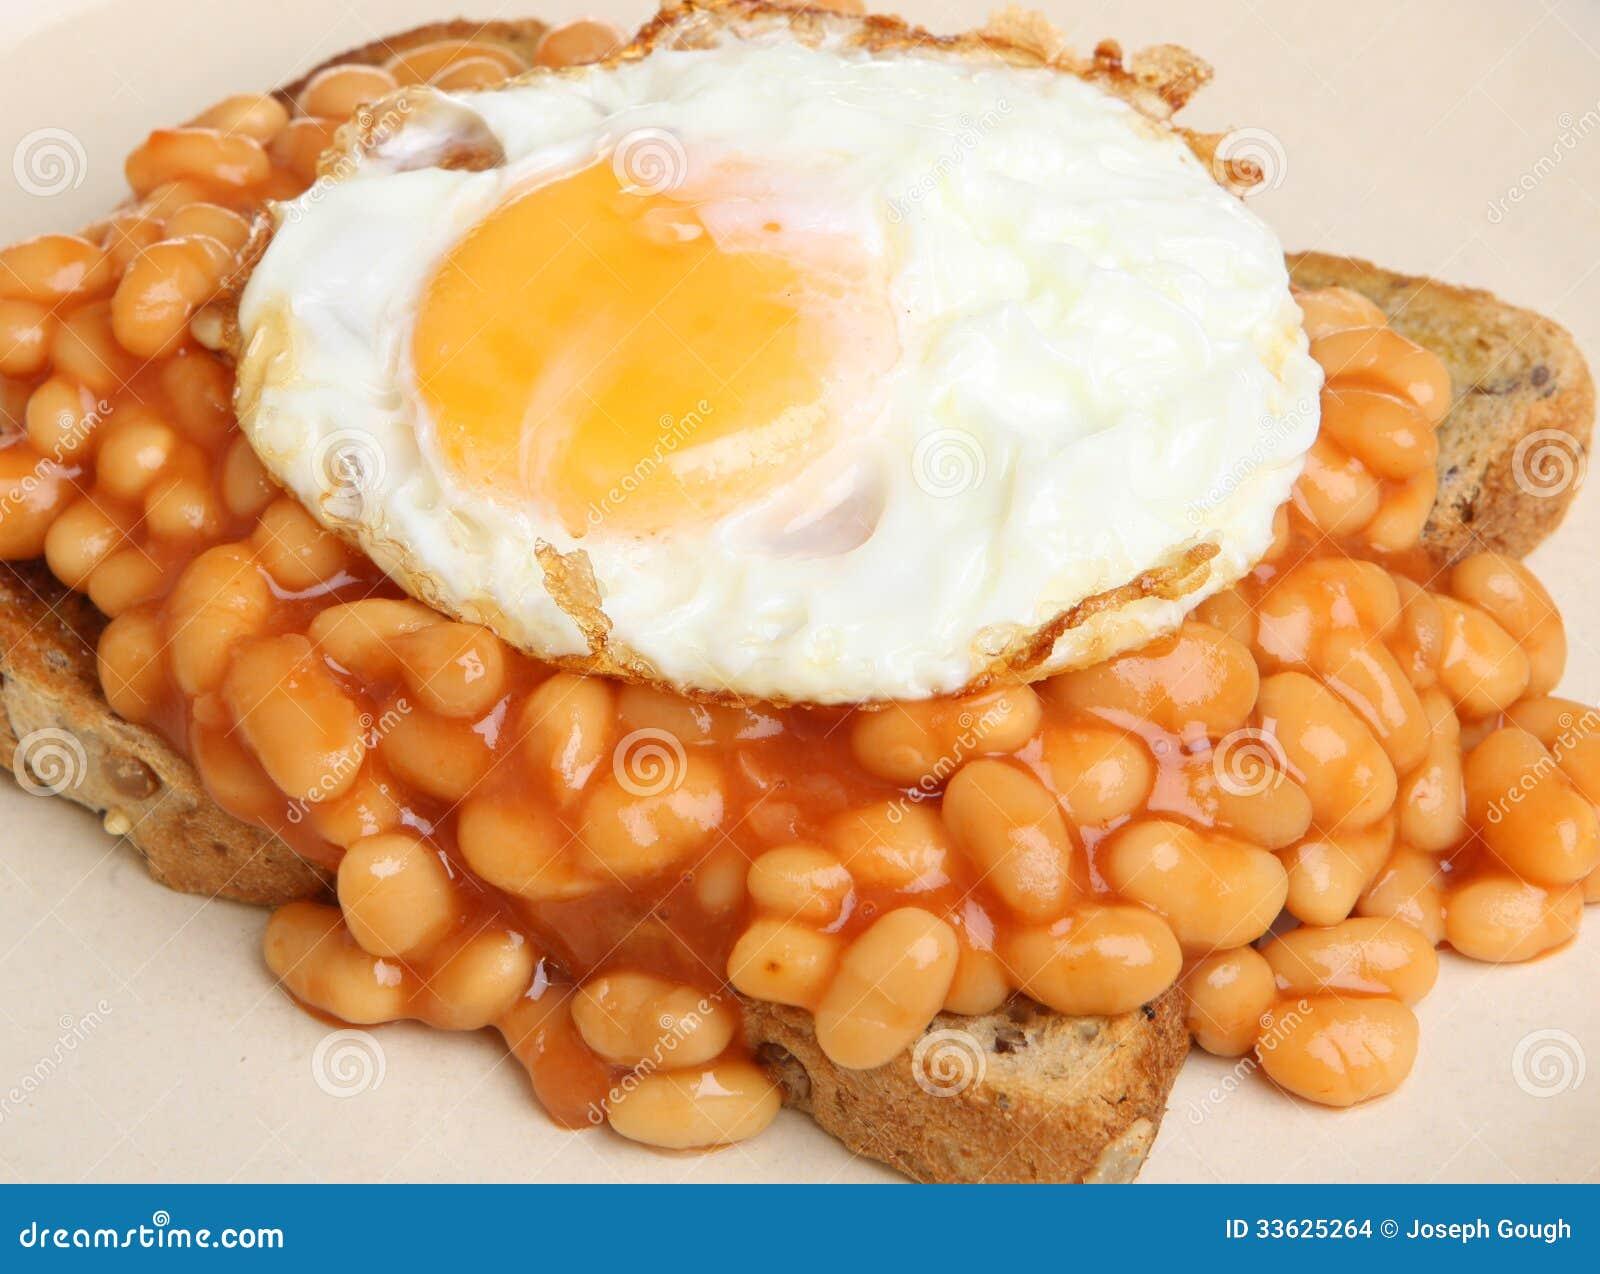 Baked Beans & Fried Egg On Toast Stock Images - Image: 33625264